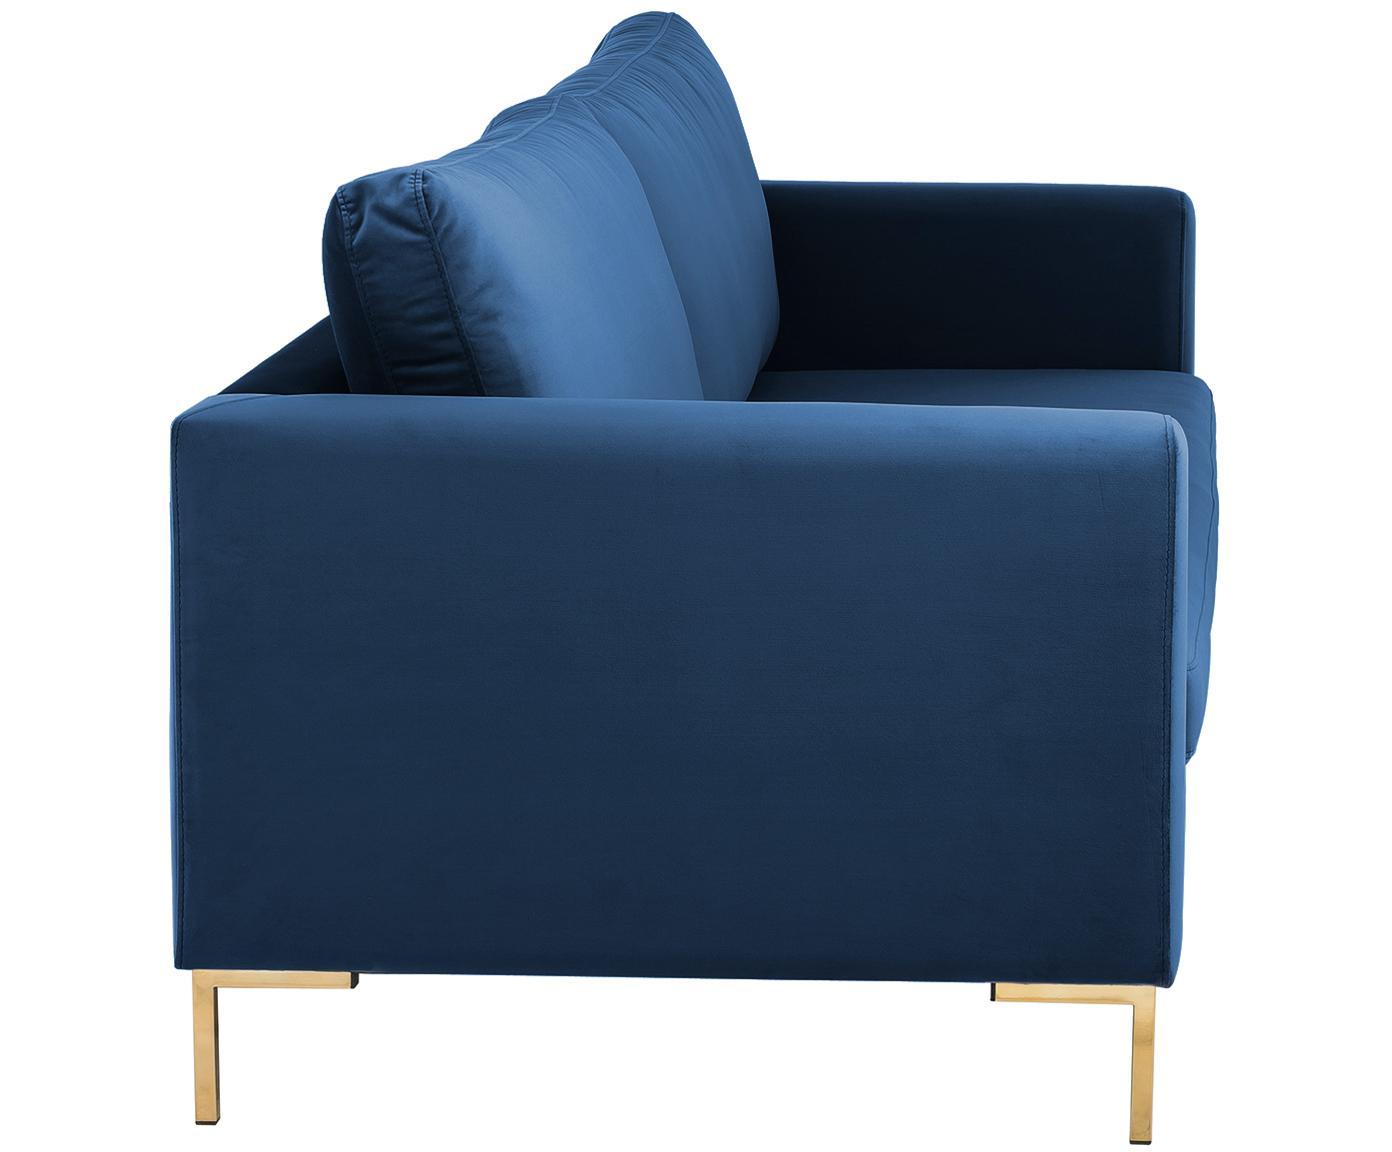 Samt-Sofa Luna (3-Sitzer), Bezug: Samt (Polyester) 80.000 S, Gestell: Massives Buchenholz, Füße: Metall, galvanisiert, Samt Blau, Gold, B 230 x T 95 cm